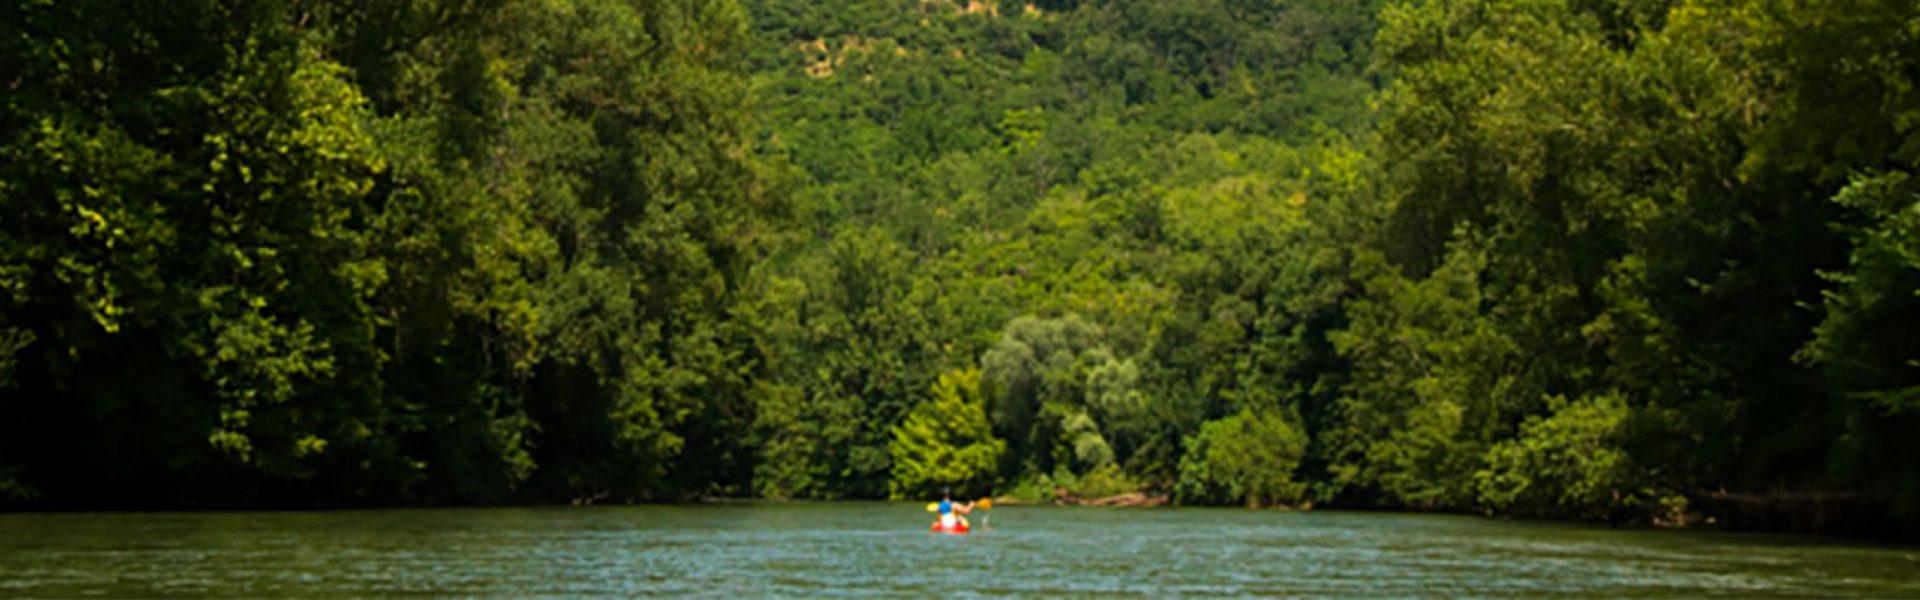 Granhòta canoë-kayak